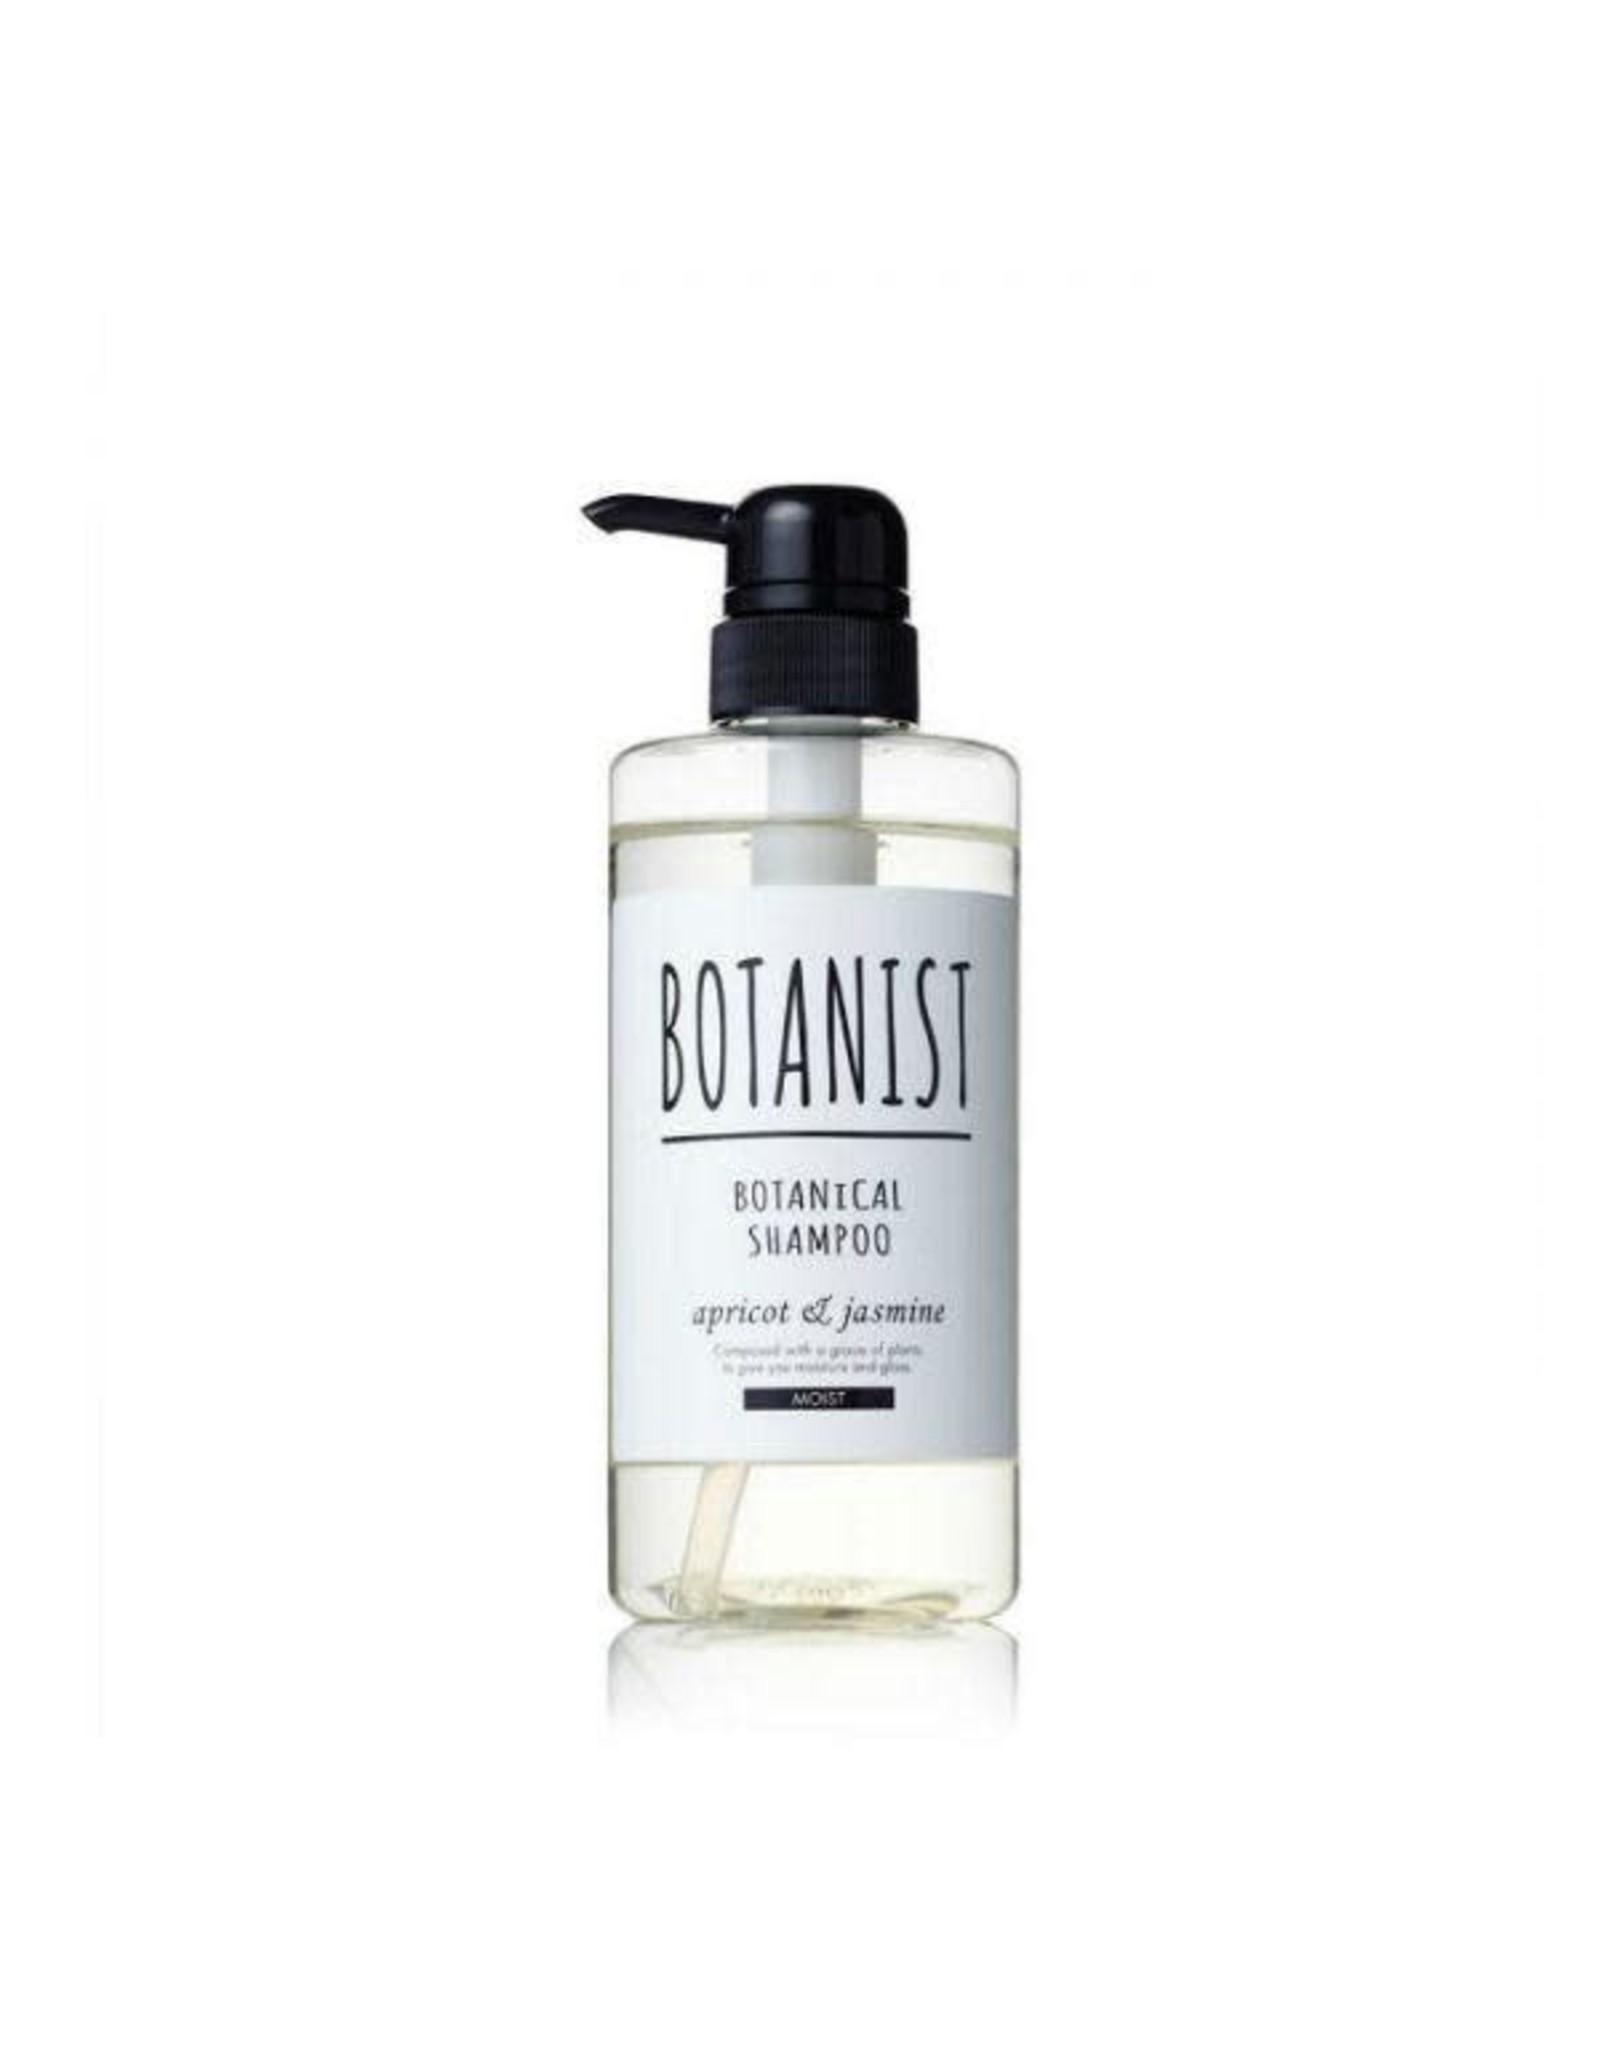 Botanist Botanist Botanical Shampoo Apricot & Jasmine